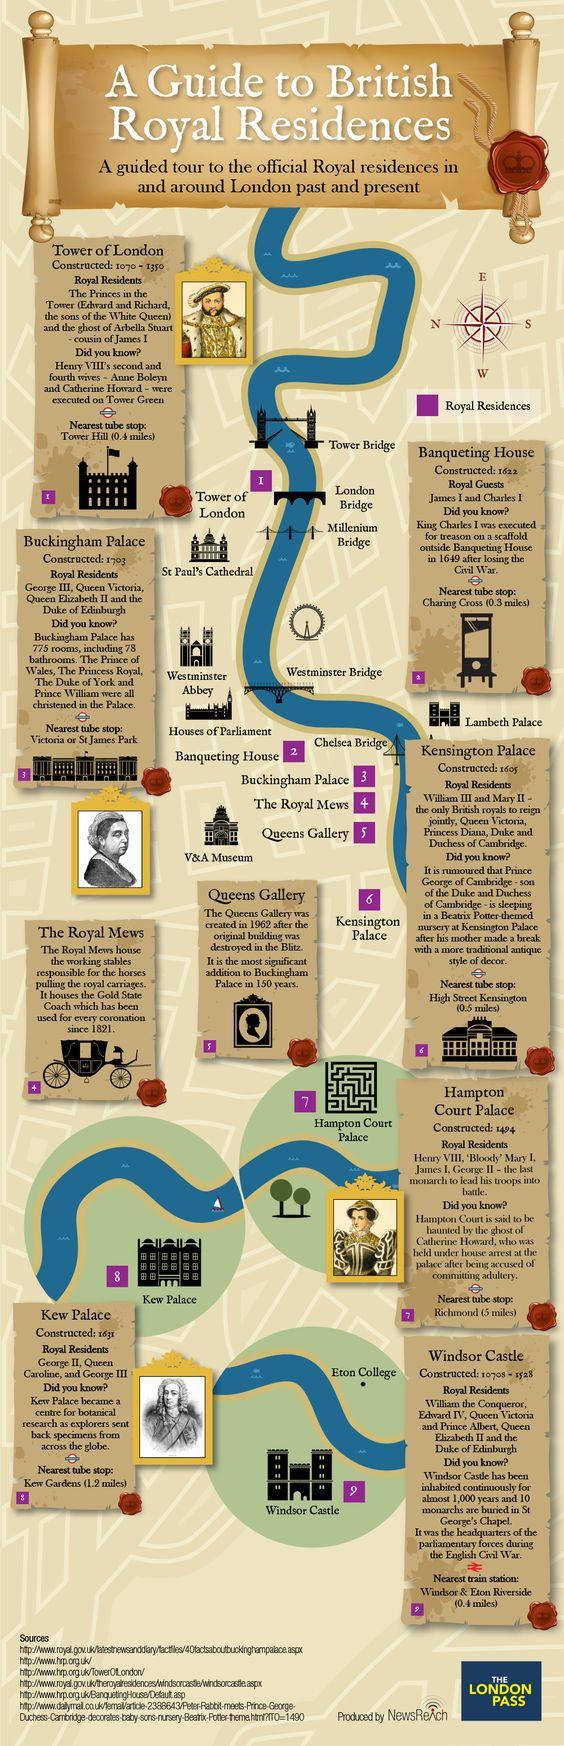 A Guide To British Royal Residences   #Infographic #RoyalResidence #British